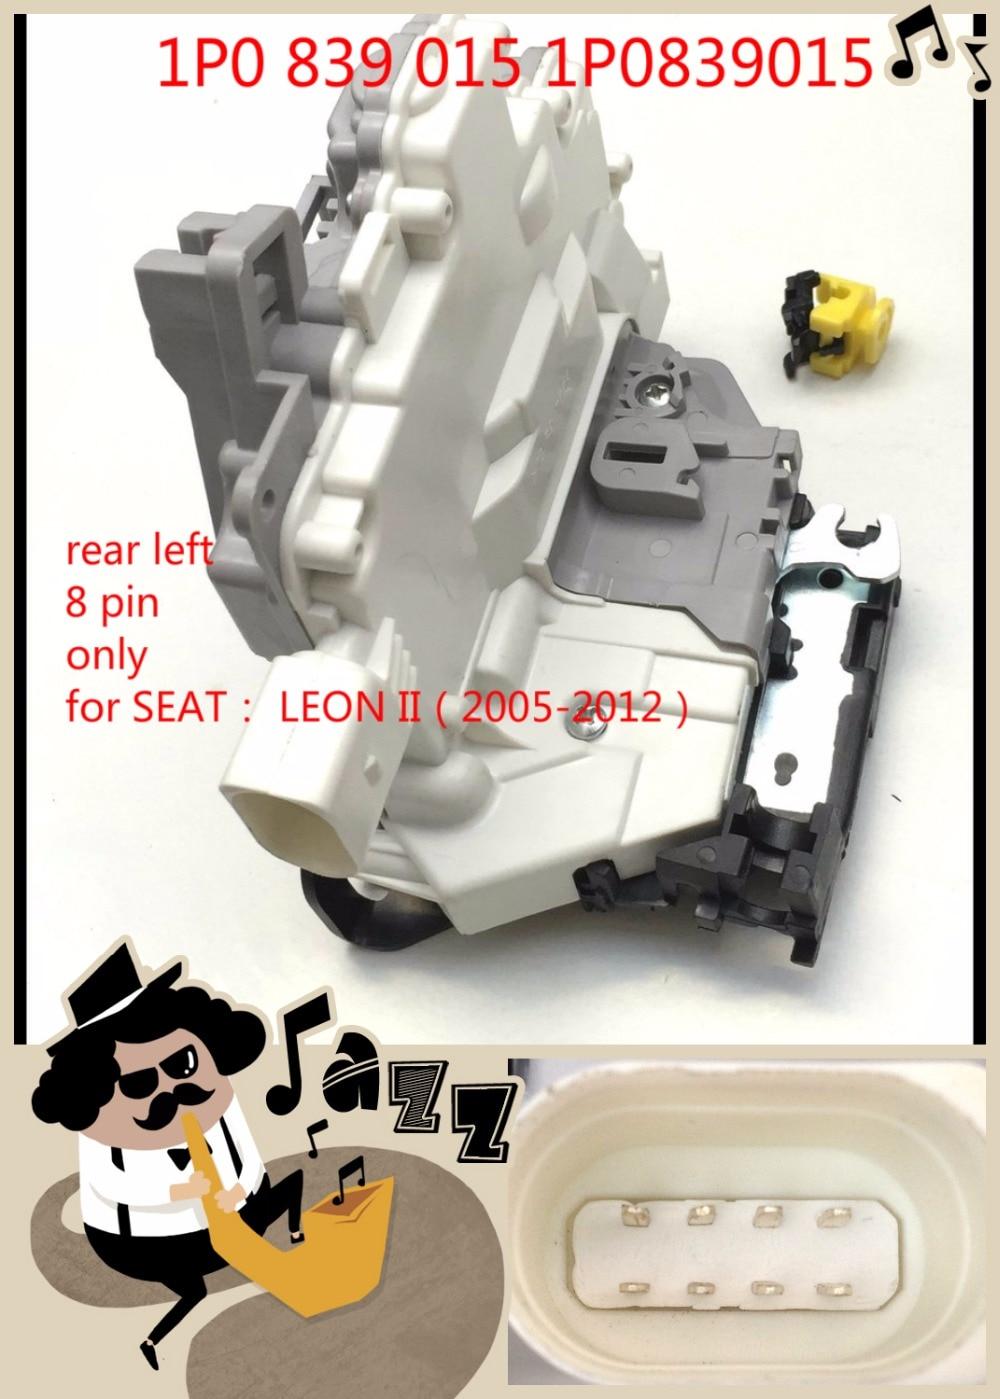 Carbon Fibre Effect SEAT LOGO Seat Leon 1M MK1 Strut Cap Covers Cupra ABS